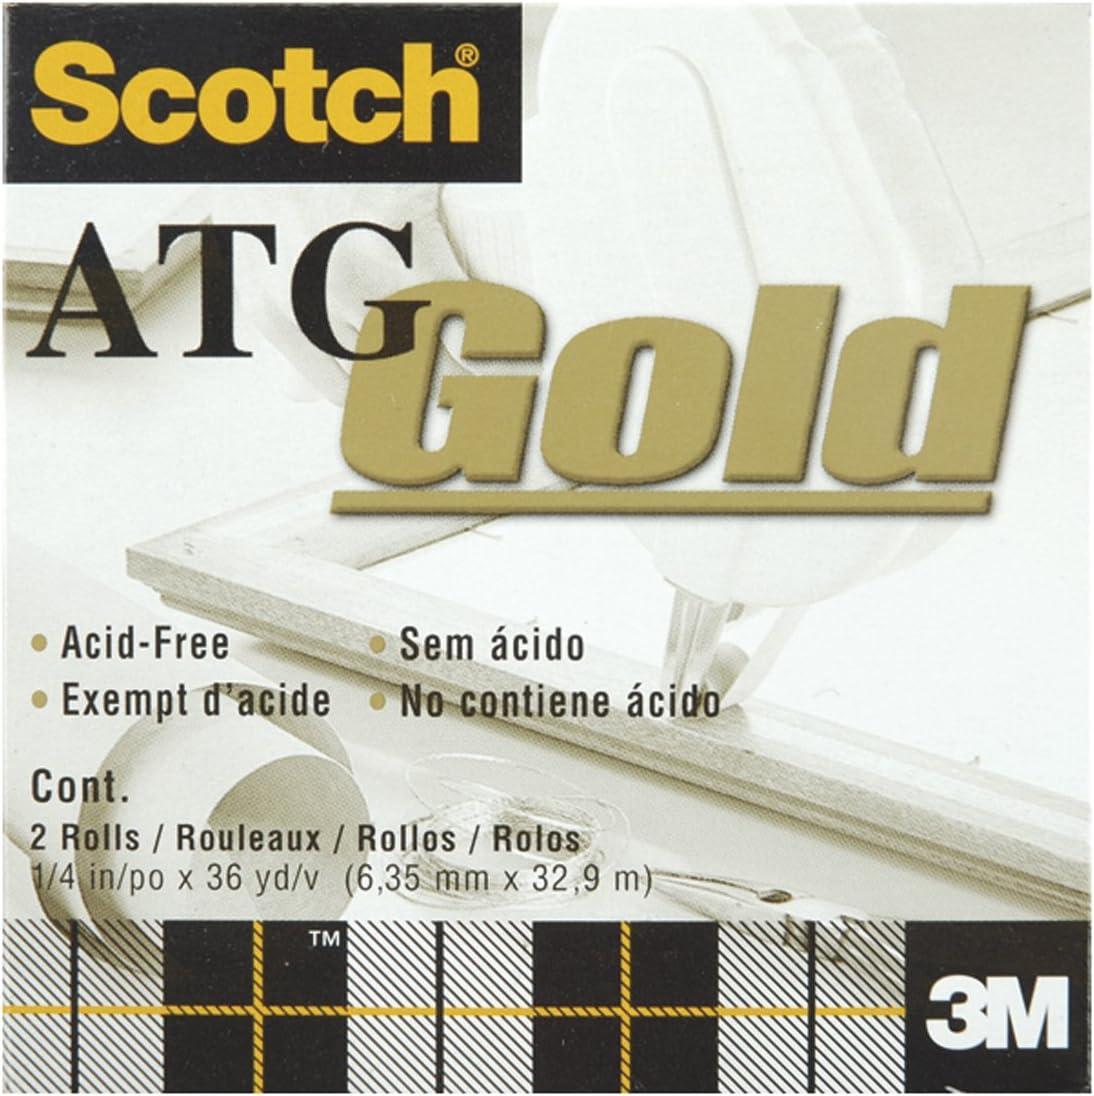 Scotch 3M ATG Adhesive Tape Glider Gun General Purpose Refill 30 rolls 1//4x36yd